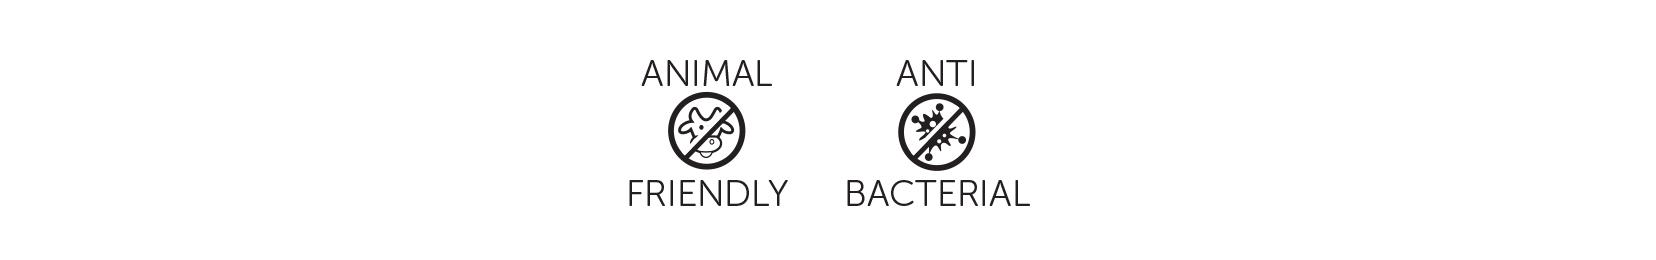 2b animal friendly anti bac.jpg